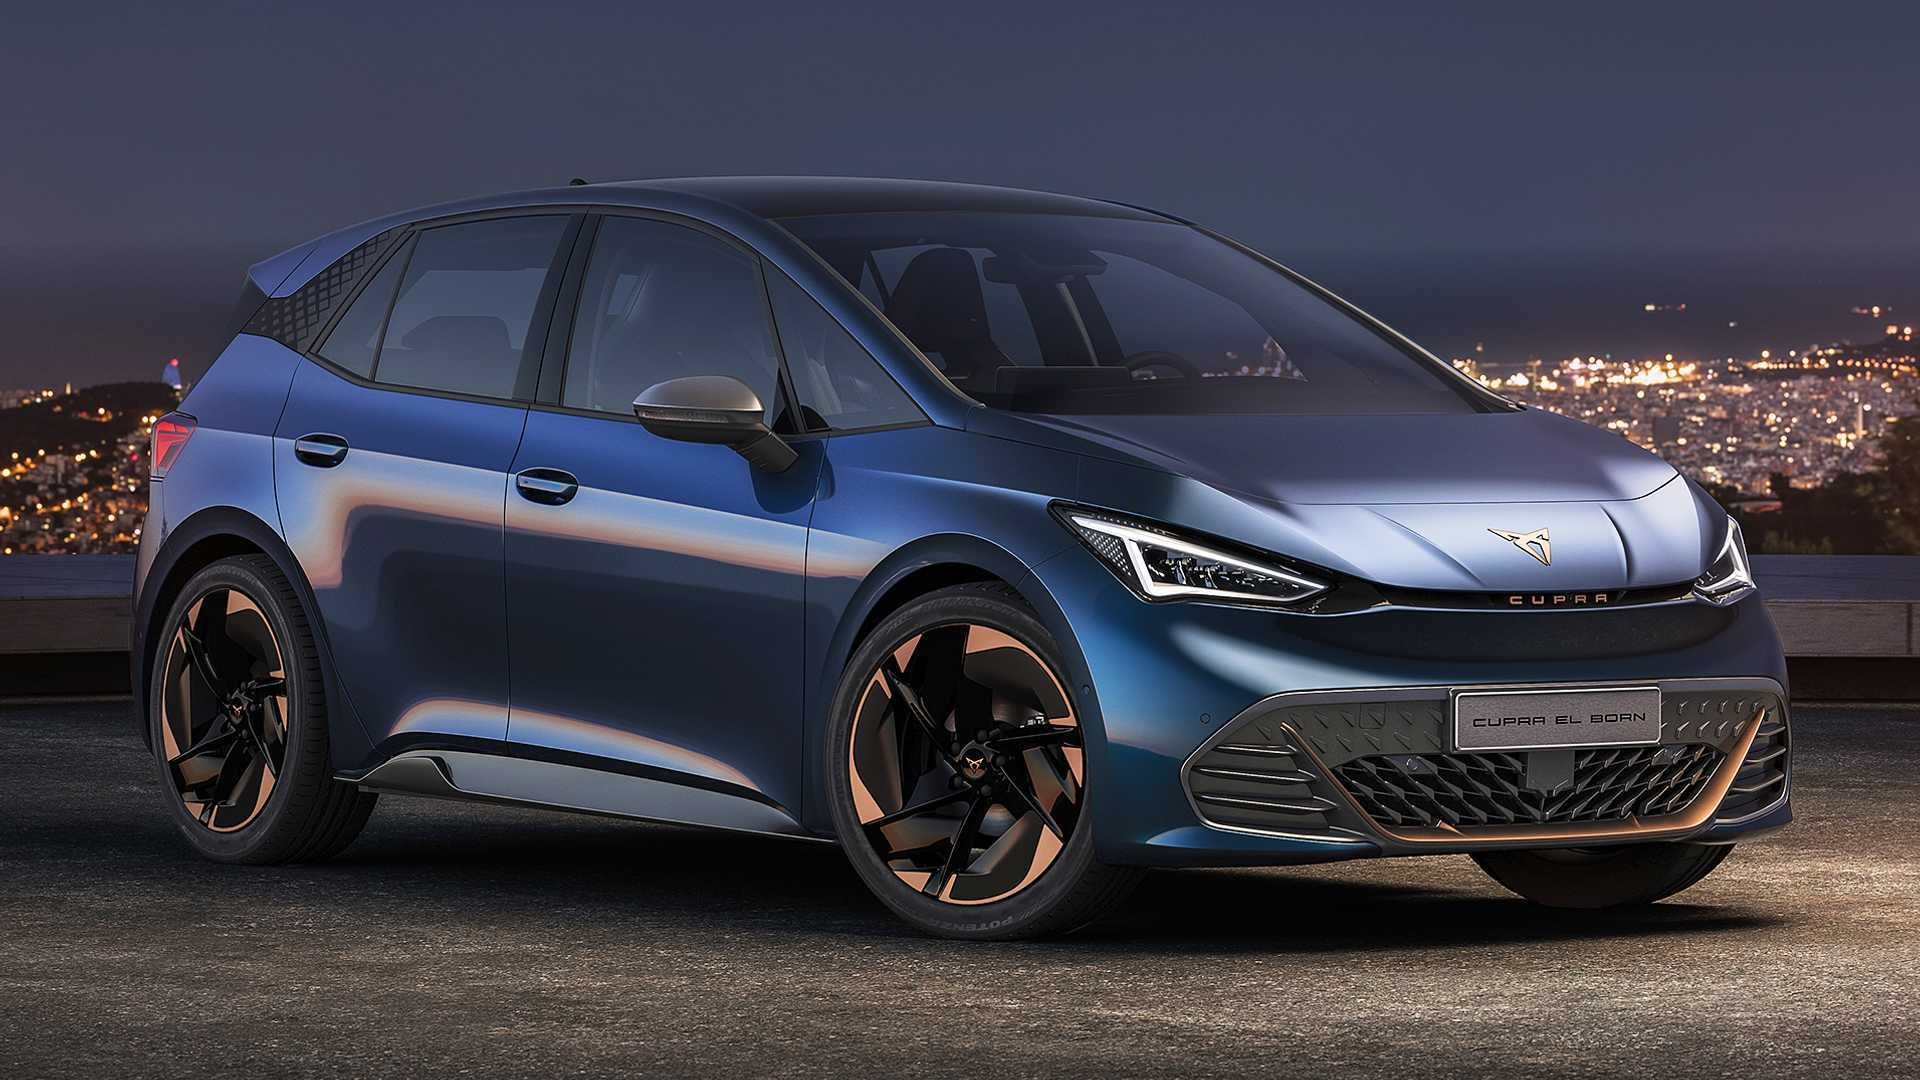 Cupra el-Born准量产版官图发布,新车定位为紧凑型纯电动车